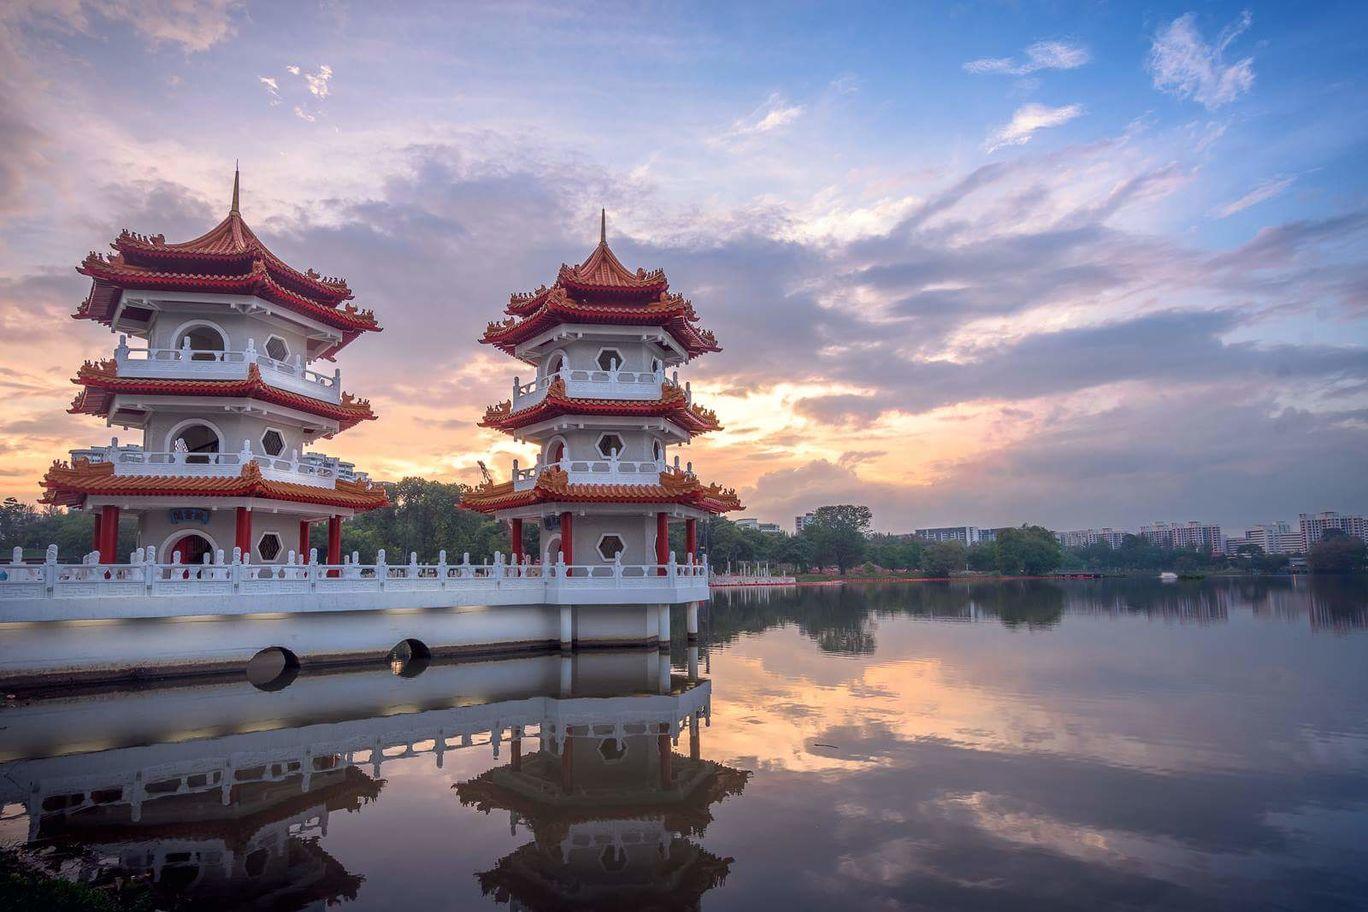 Photo of Chinese Garden By Antara Sharma